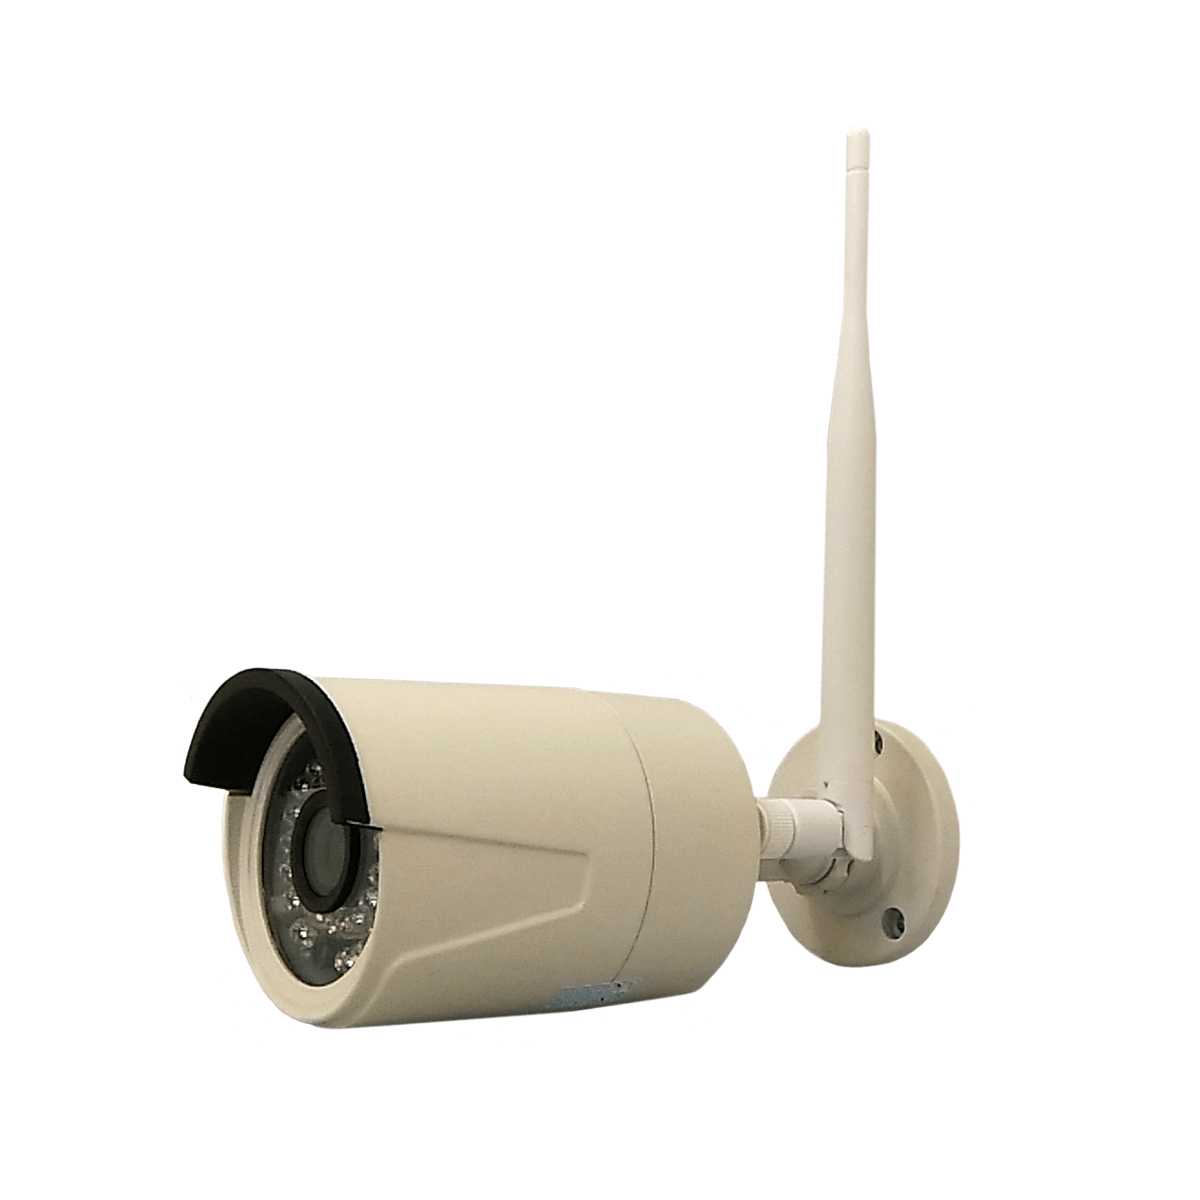 KIT CFTV Completo IP Wifi Sem Fio 4 Canais Vídeo Demonstrativo